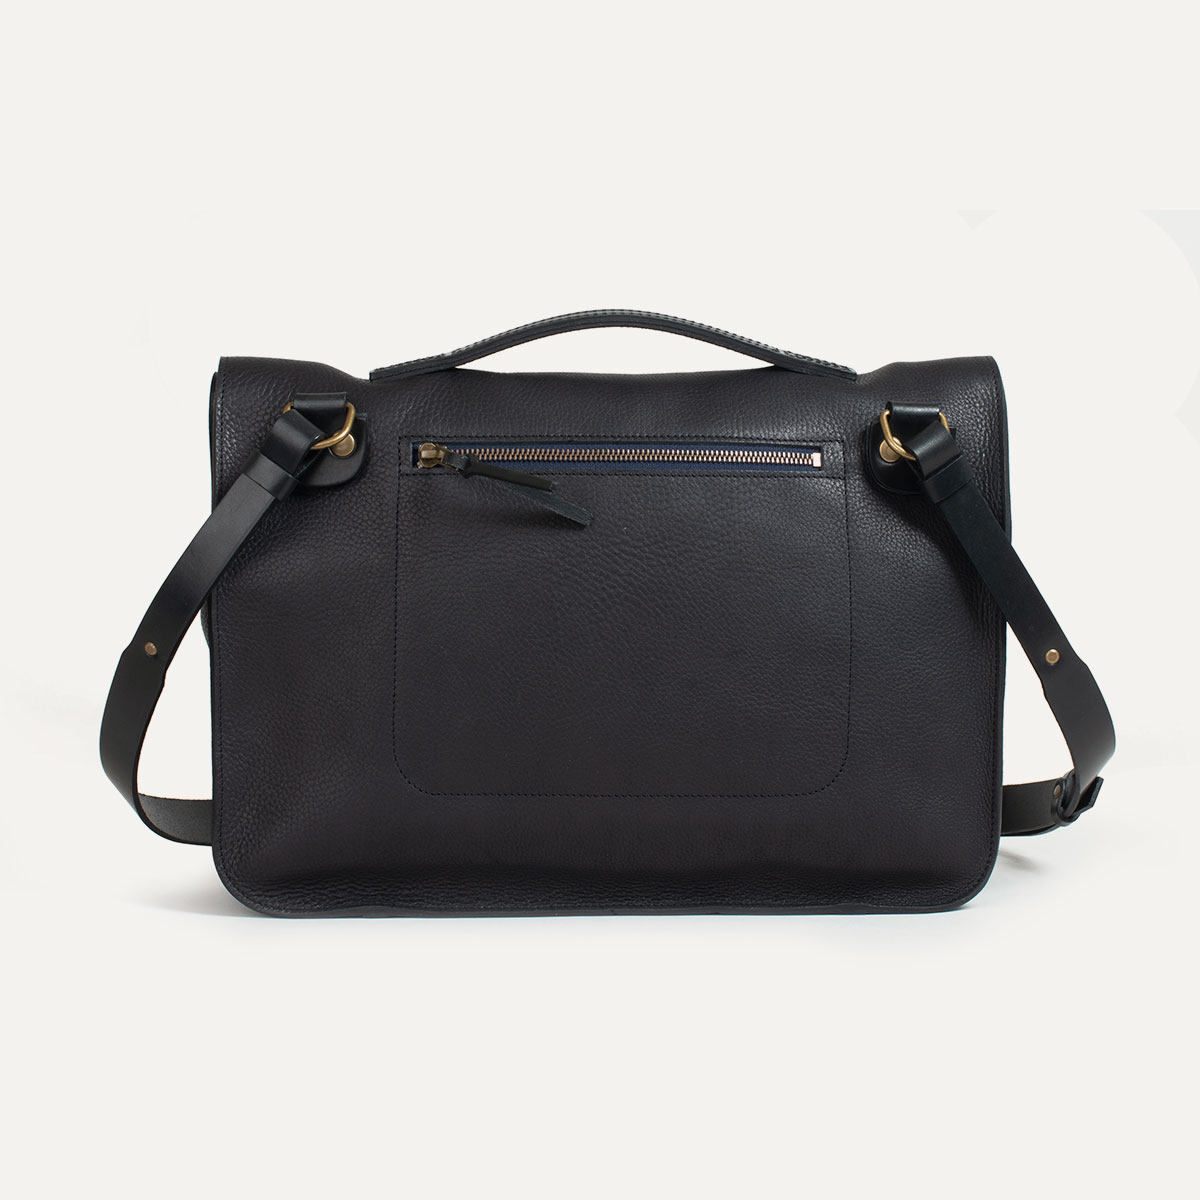 sac cartable cuir i made in france bleu de chauffe. Black Bedroom Furniture Sets. Home Design Ideas